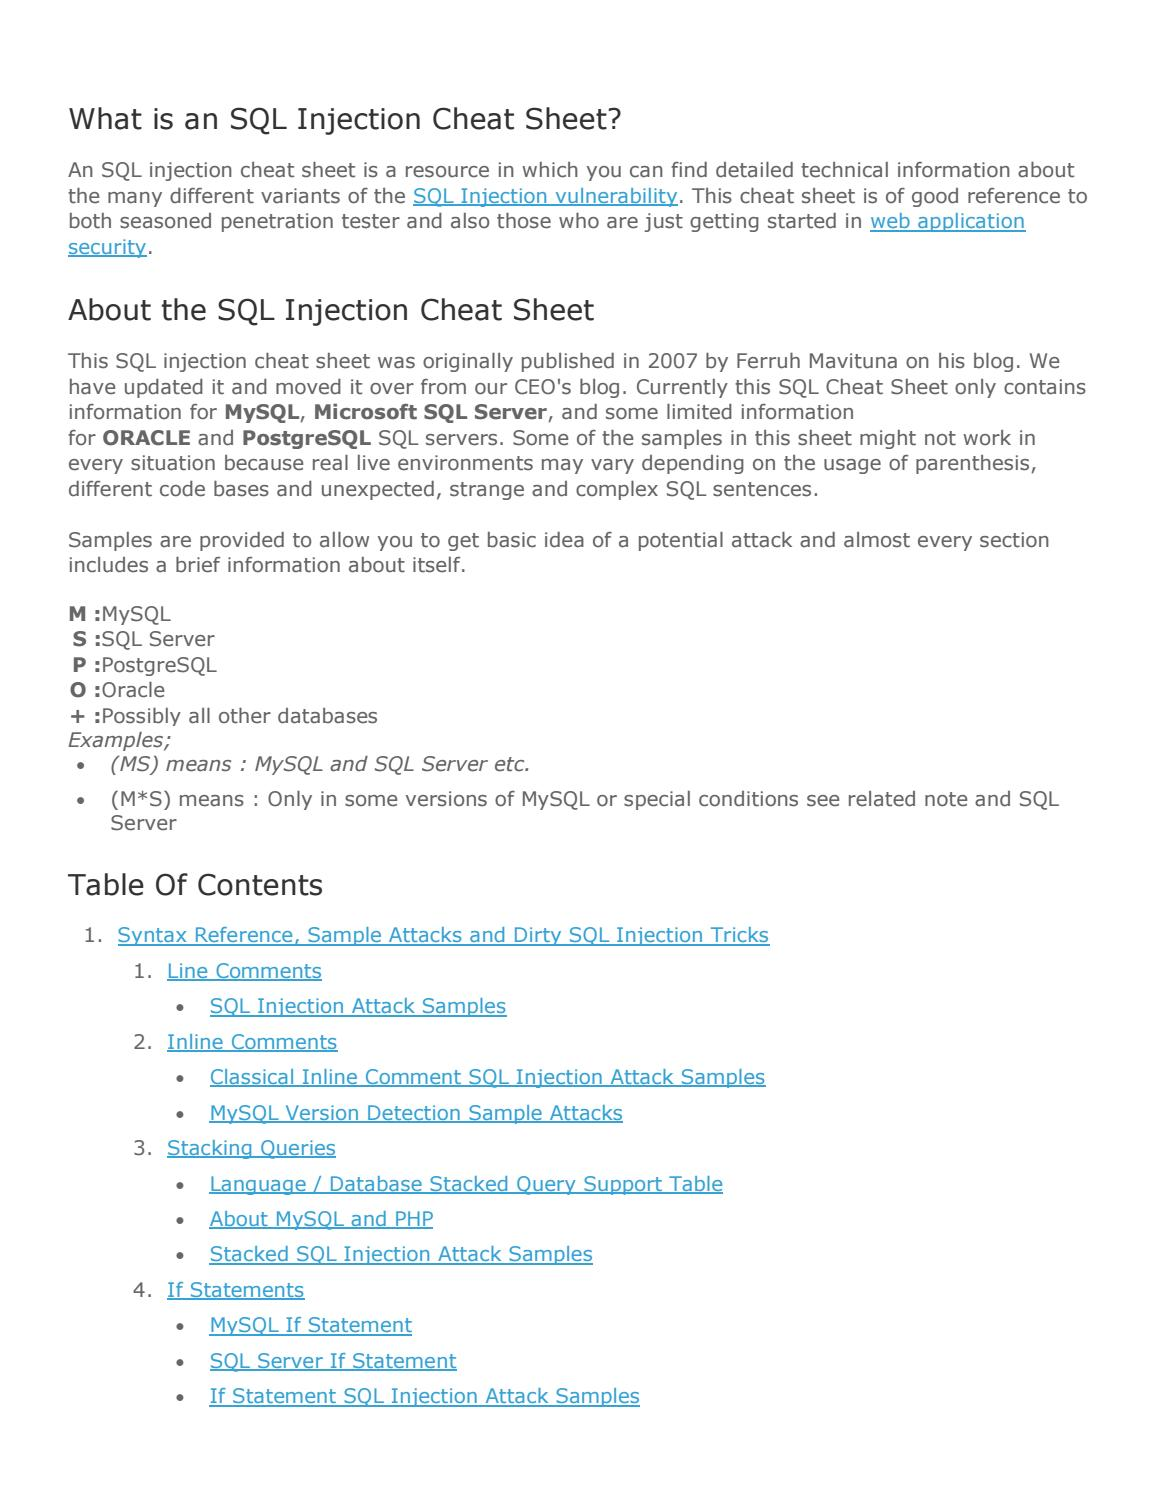 Sql injection cheat sheet by DragoN JAR - issuu